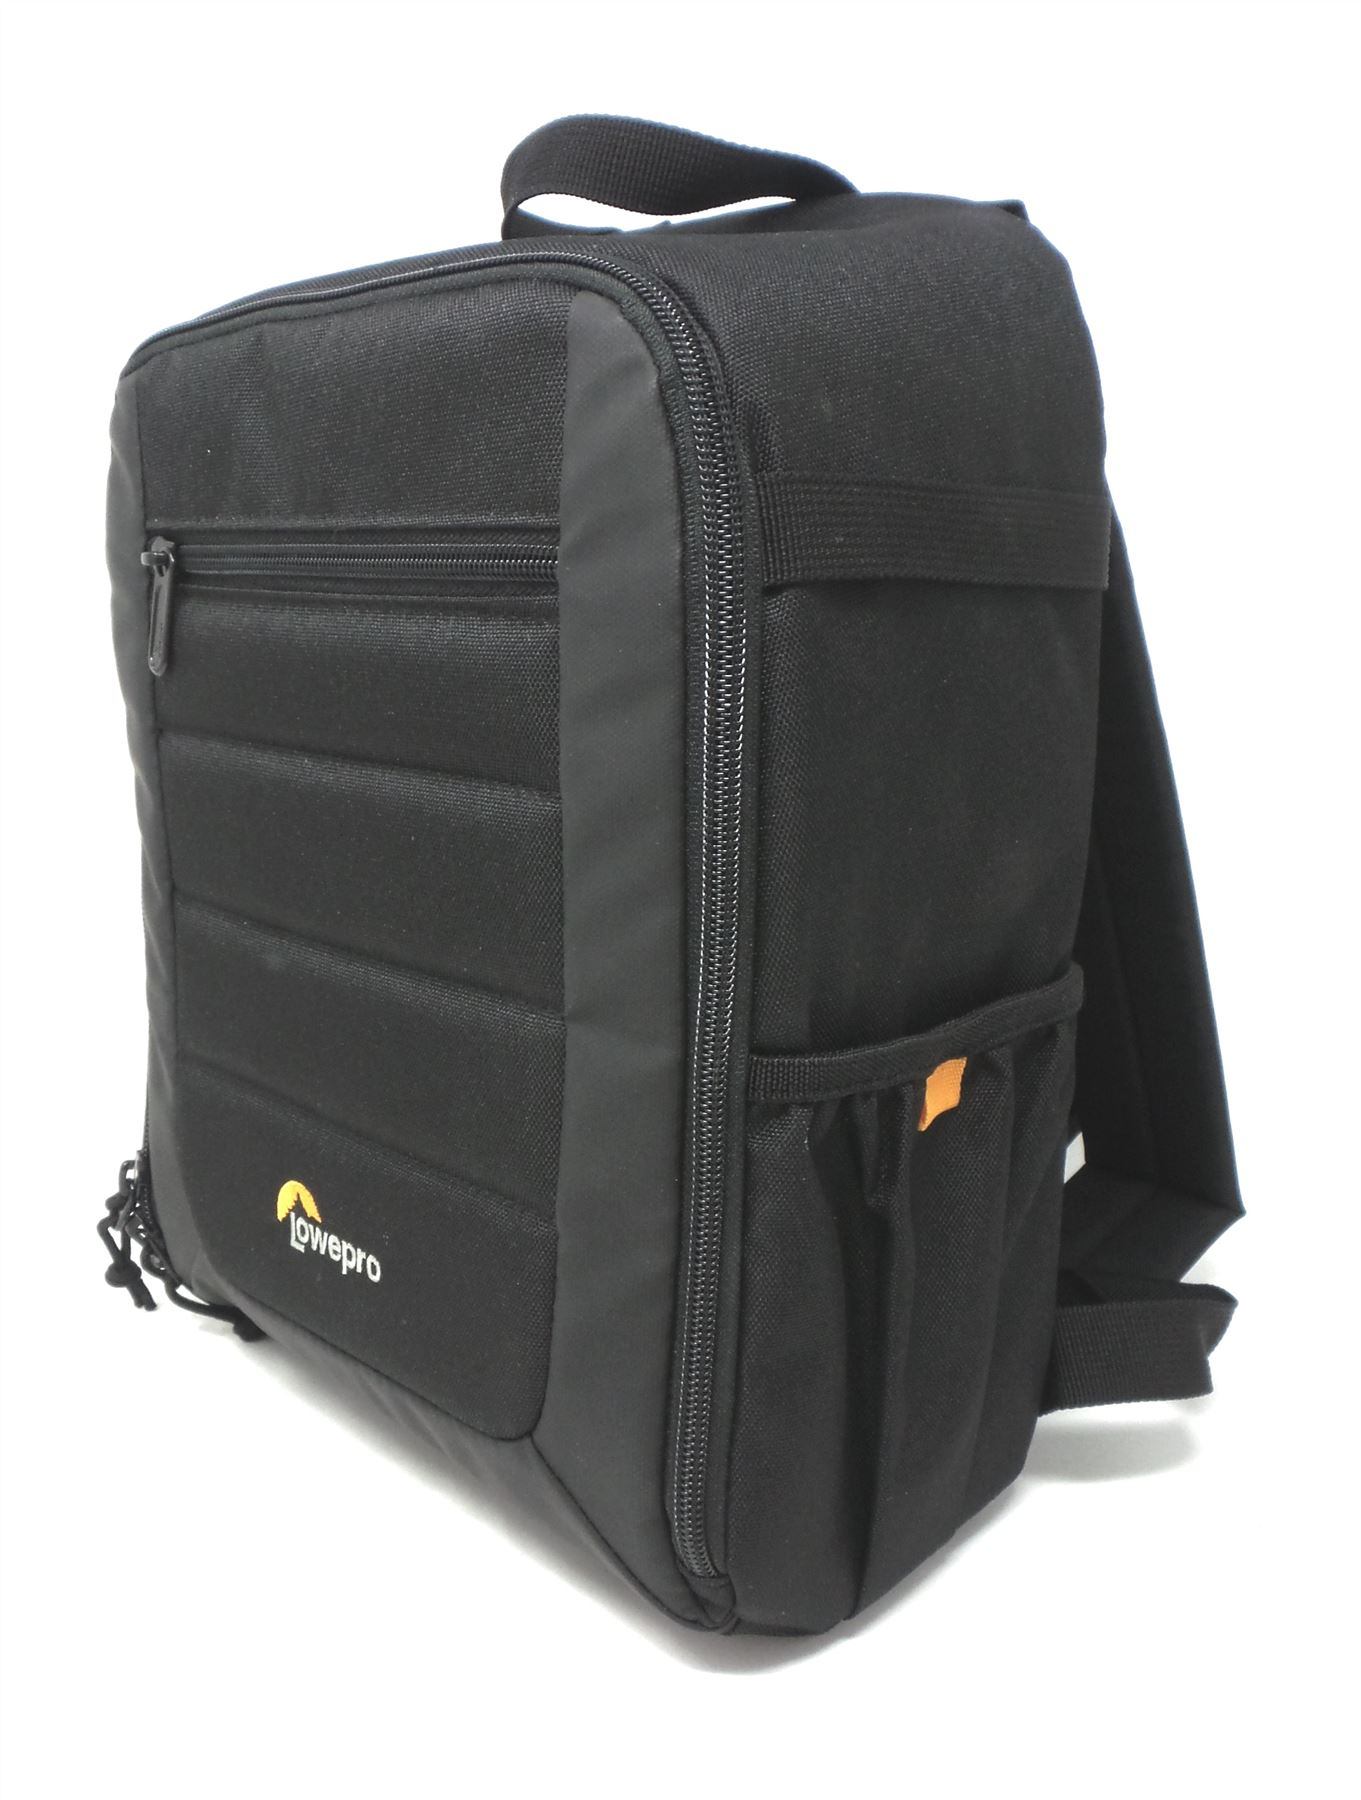 Lowepro Format BP 150 II DSLR Camera Backpack Black  cae6446d68491